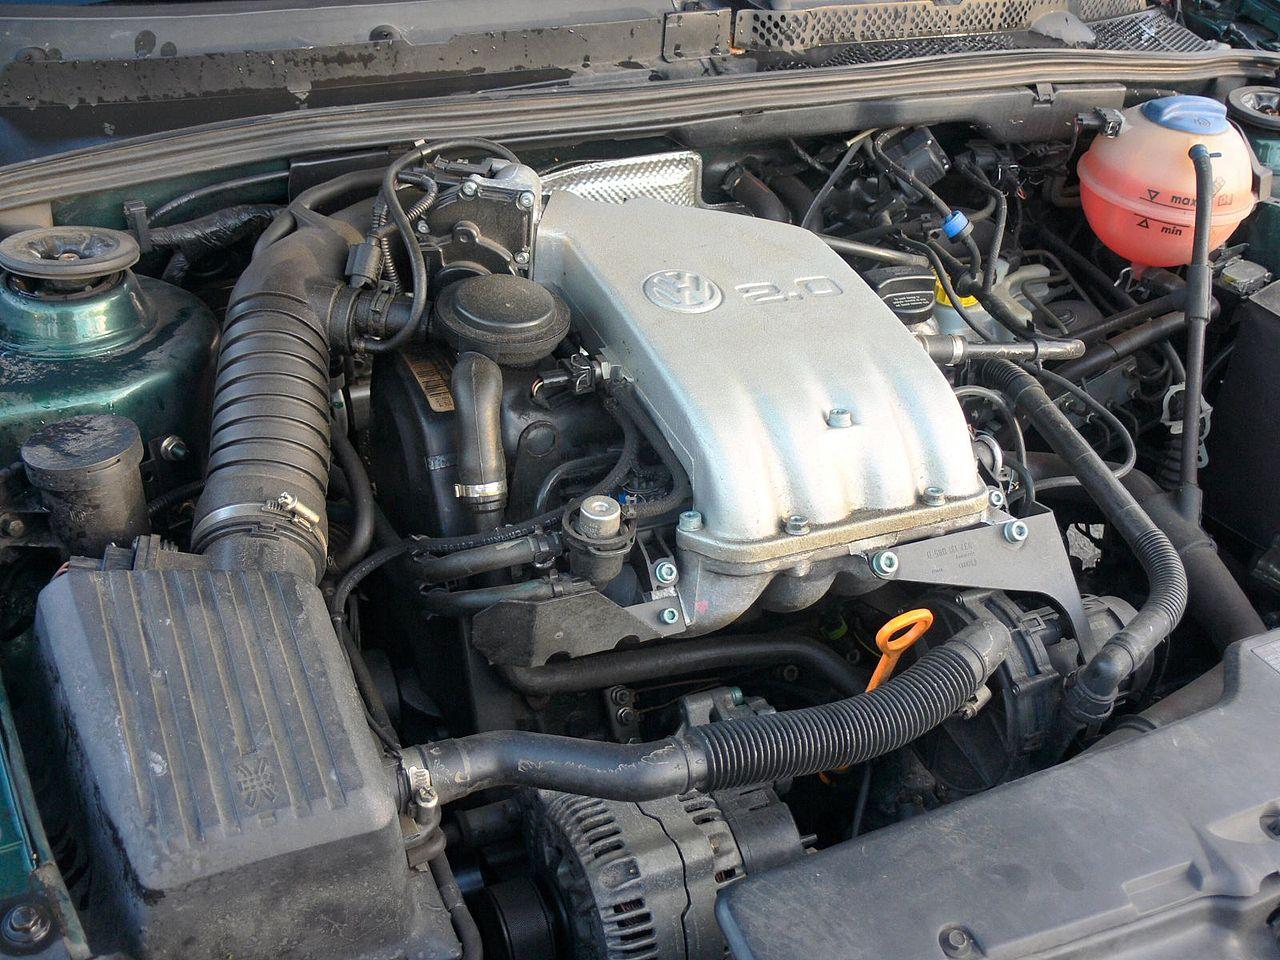 Volkswagen Jetta 2 0 Engine Diagram Manual Of Wiring Vw File Wikimedia Commons 20